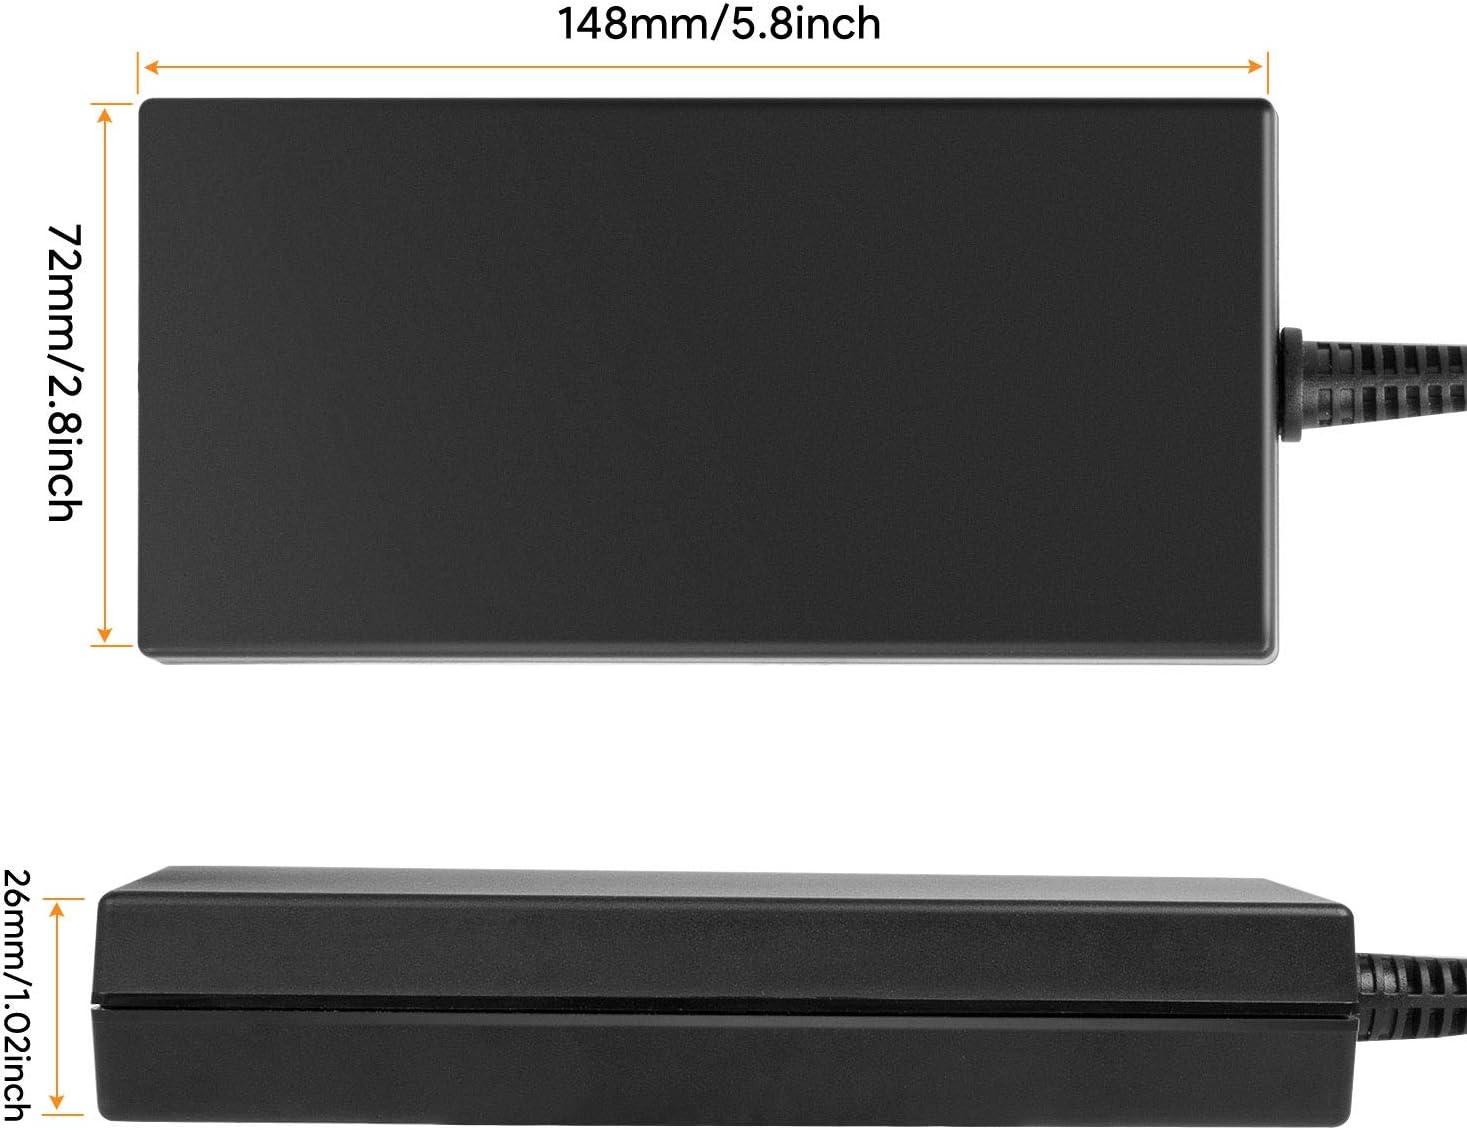 TAIFU Adaptador 120W 6,15A Cargador para Portátil Sony VAIO PCGA-AC19V7 PCGA-AC19V54 PCGA-AC19V11 Sony Bravia TV 50 55 65 LED LCD HDTV KD65XF7002 KD-55XG8596 LG 55UM7610PLB Samsung 65RU7405 Televisor: Amazon.es: Electrónica